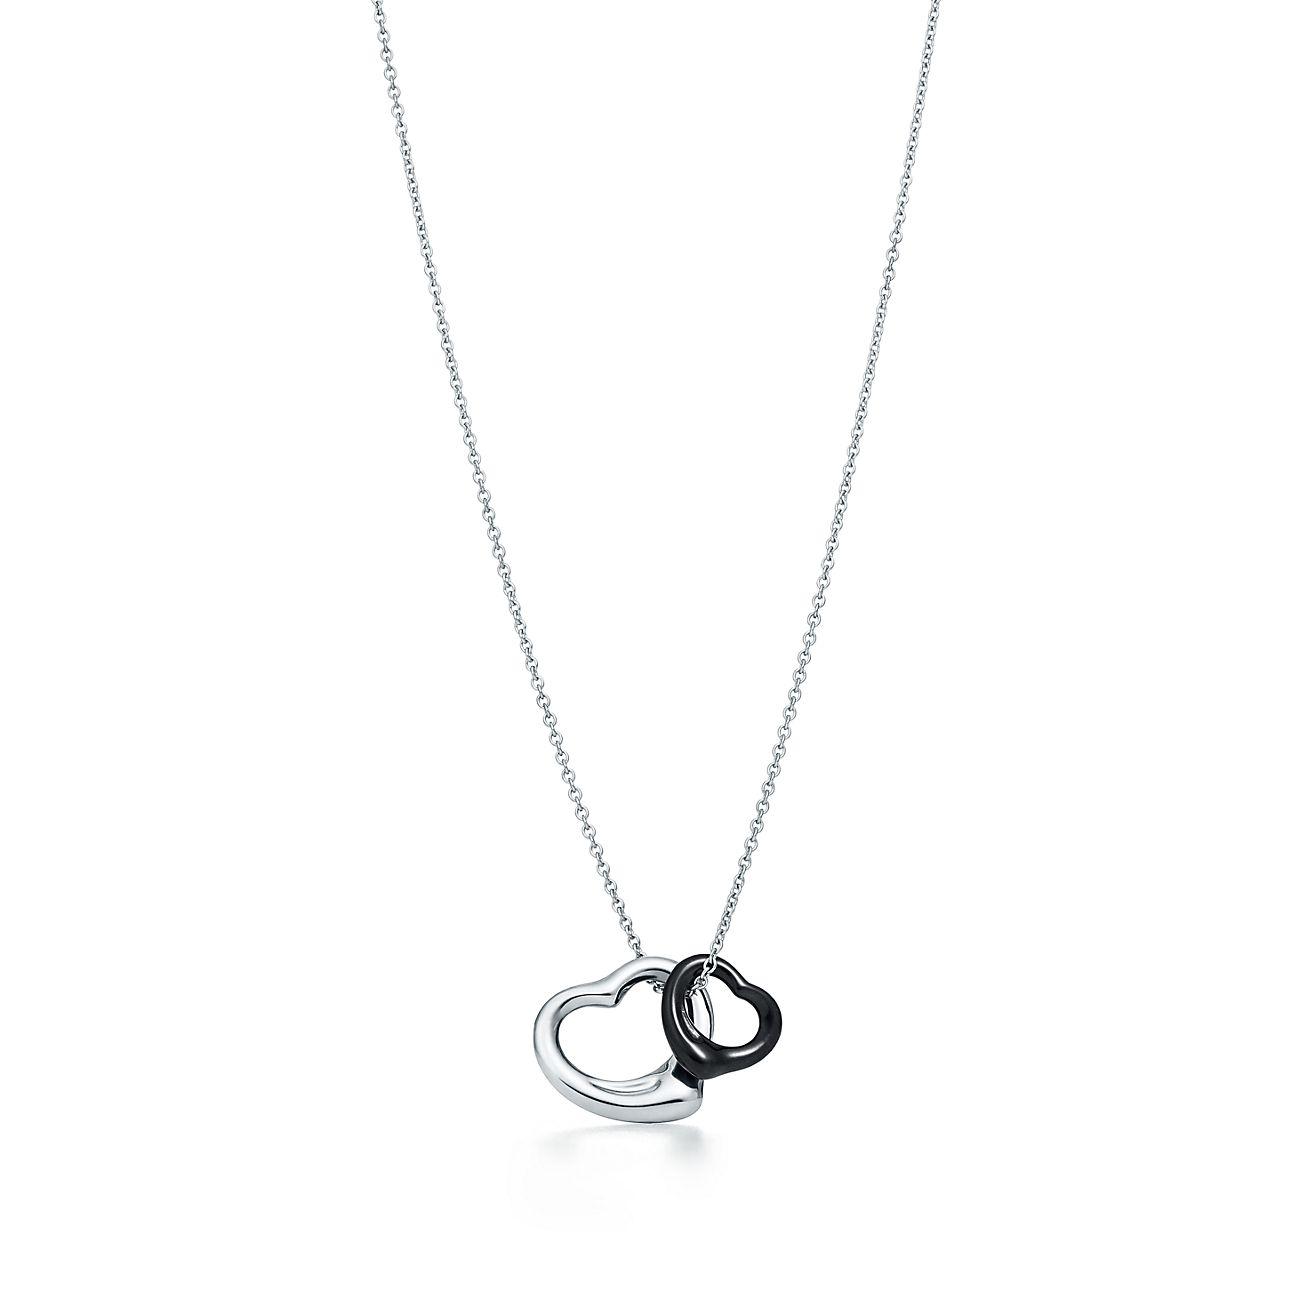 Elsa peretti open heart pendant in sterling silver and black jade elsa perettiopen heart pendant aloadofball Images